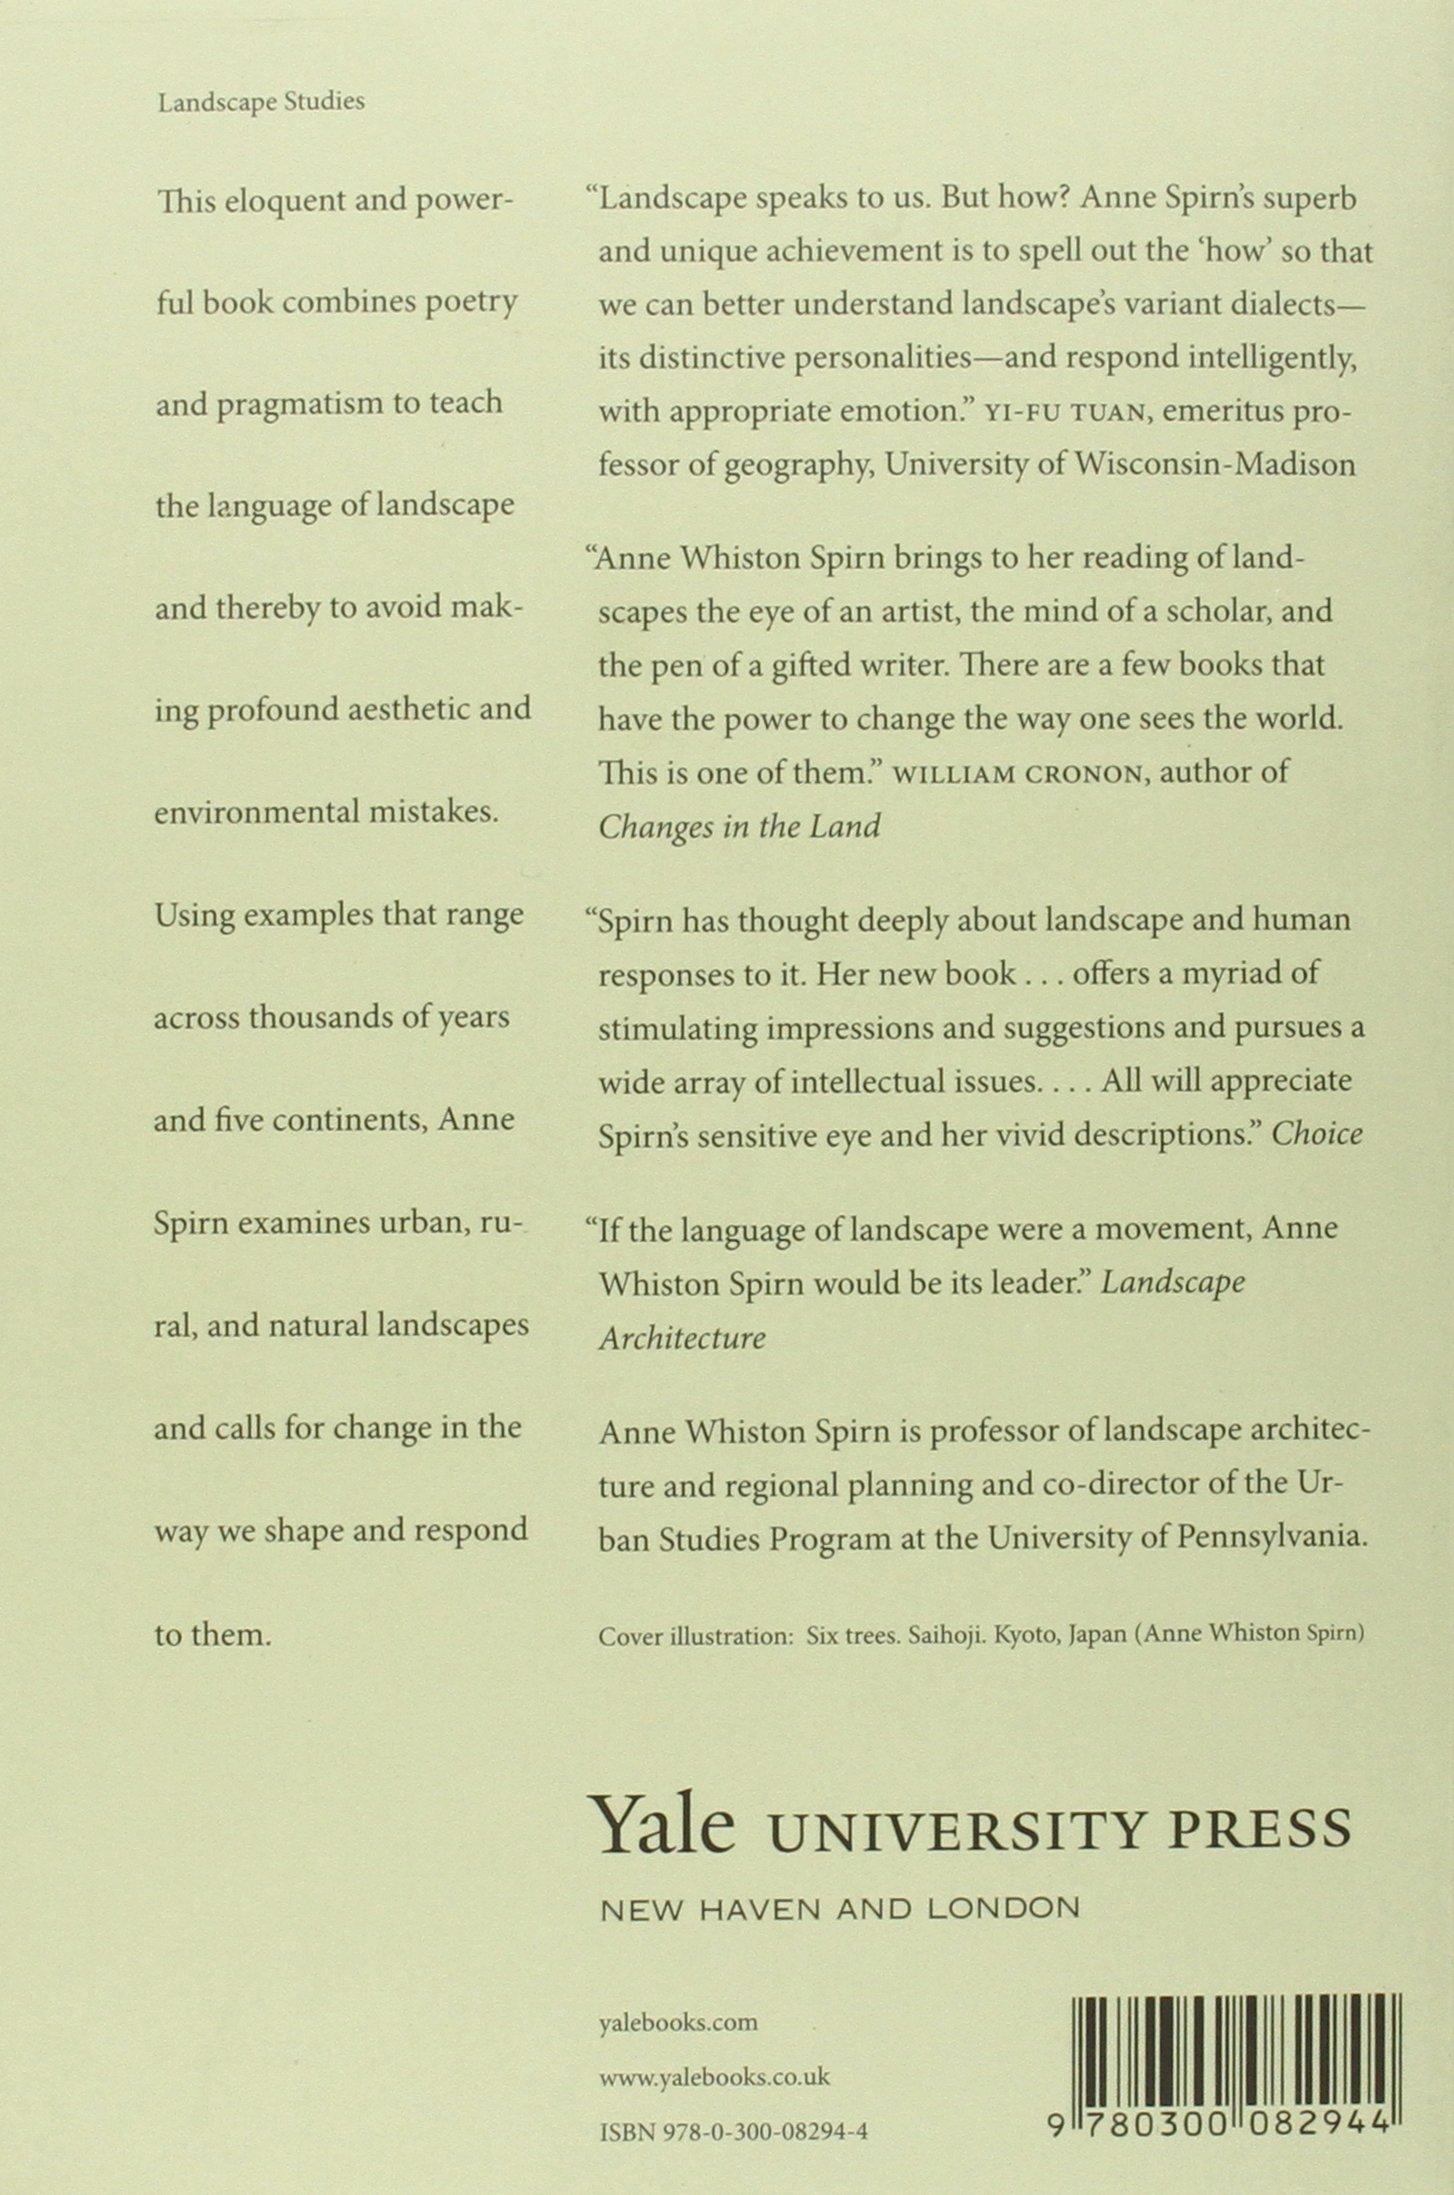 Language of Landscape by imusti